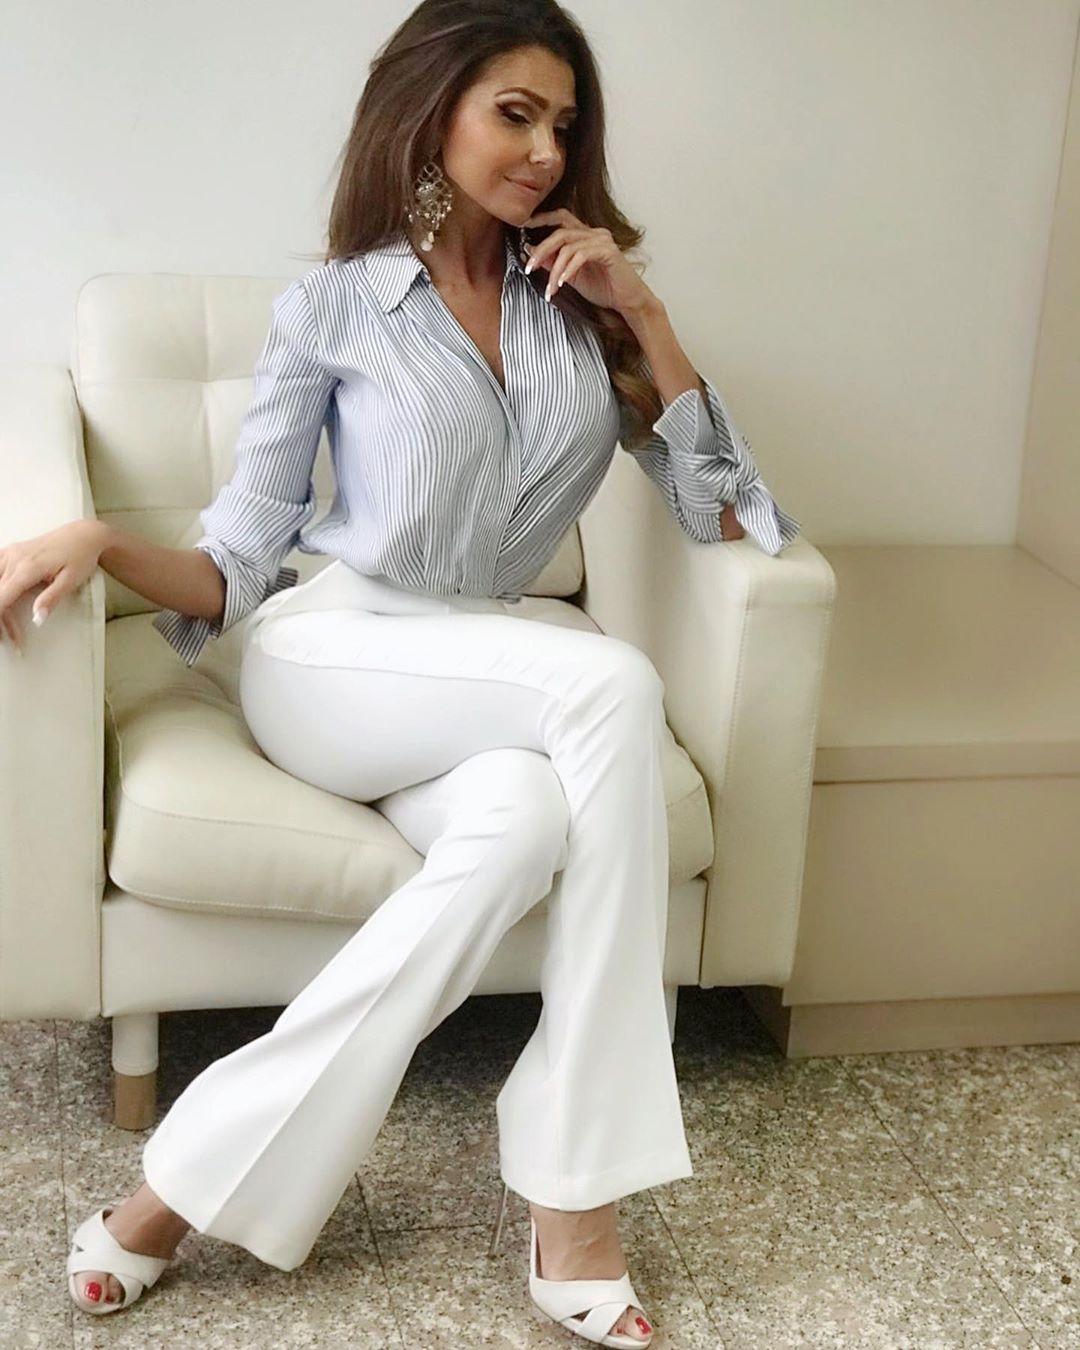 Manuela Ferrara, modella e showgirl italiana